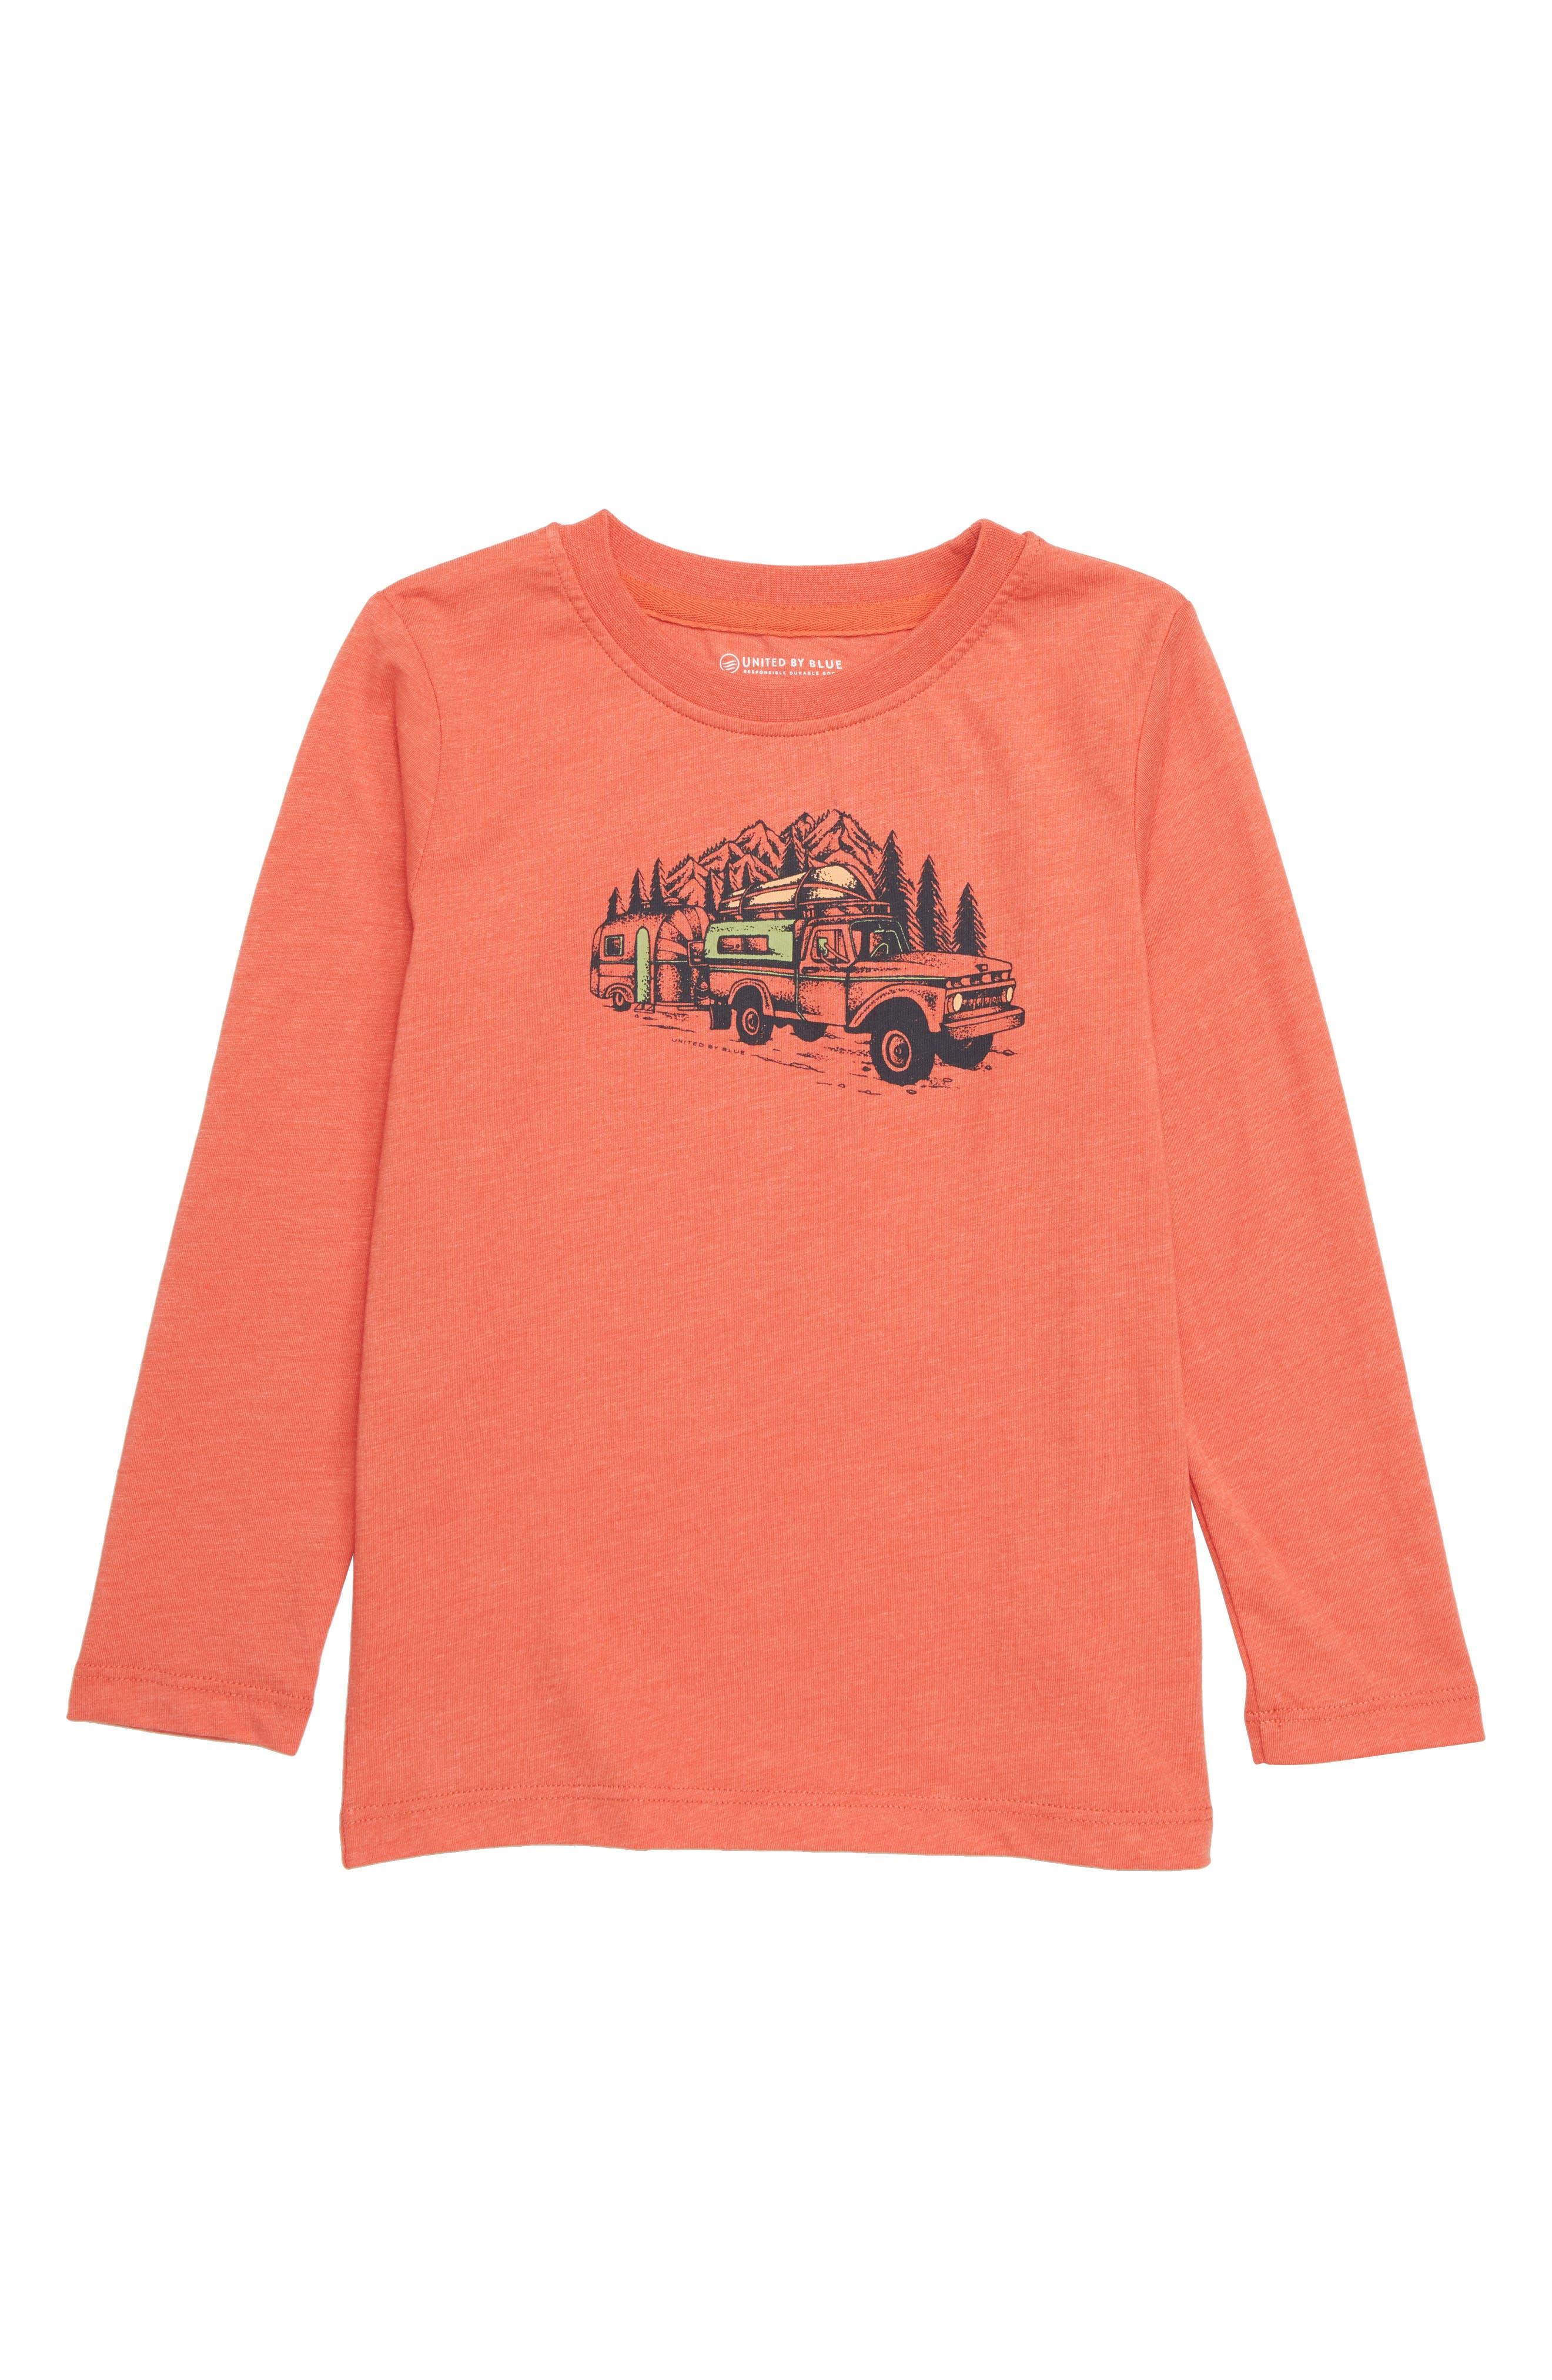 Truck 'n' Camper T-Shirt,                         Main,                         color, 800